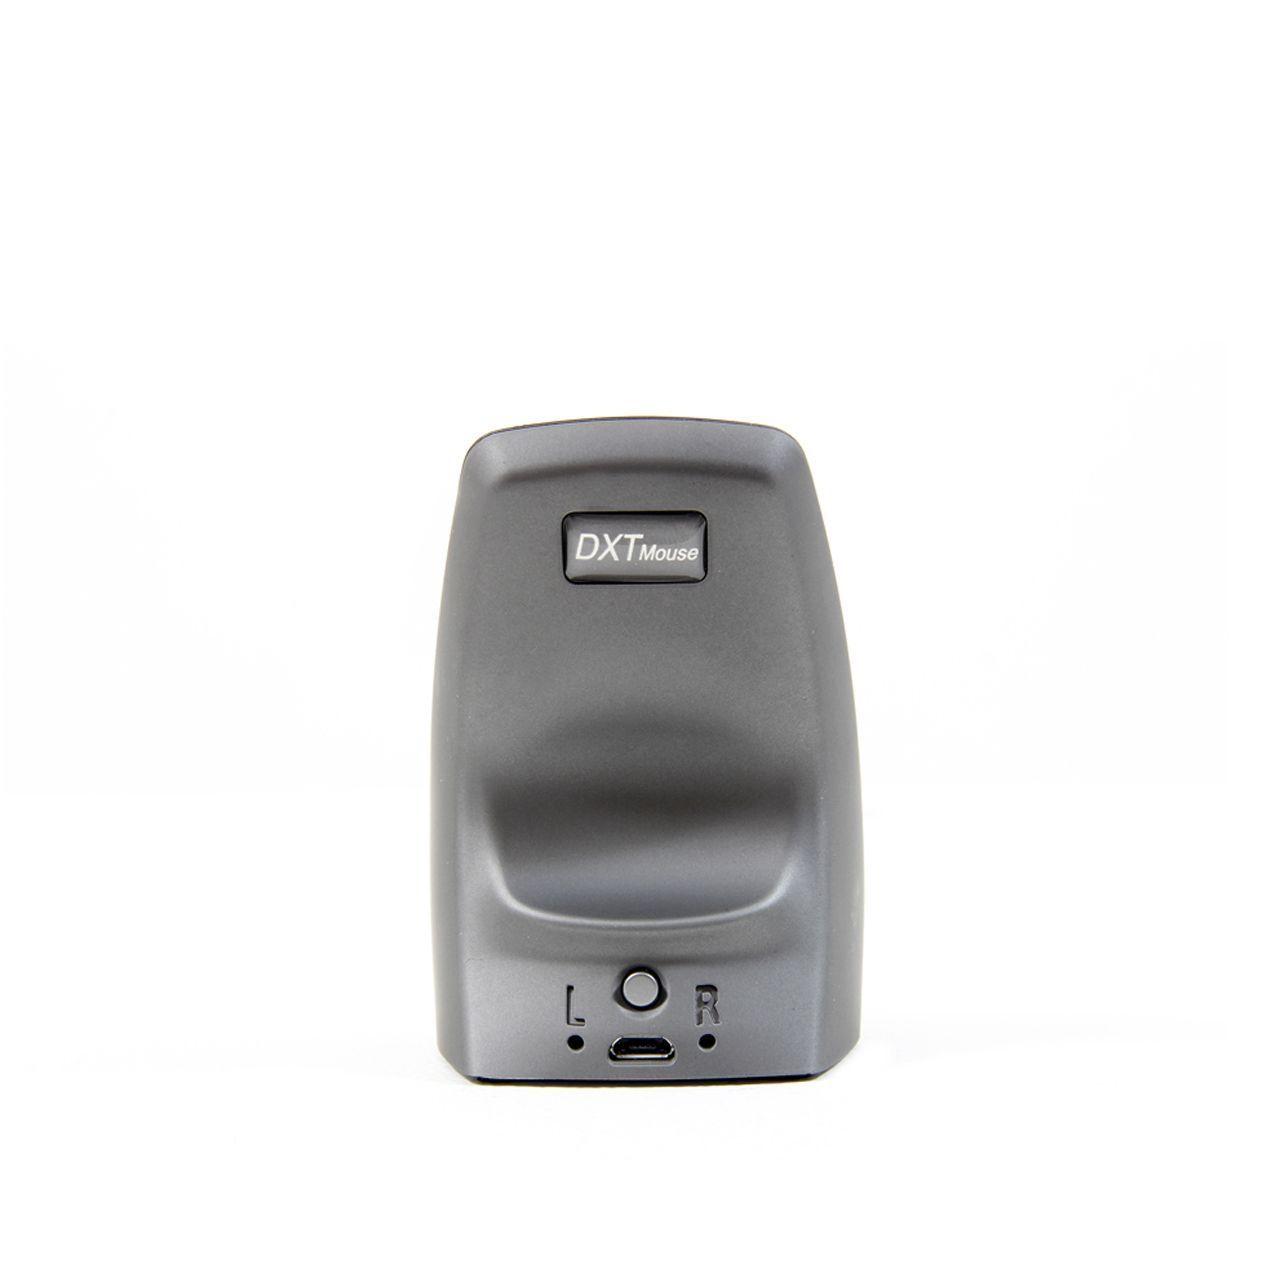 DXT verticale muis draadloos achterzijde